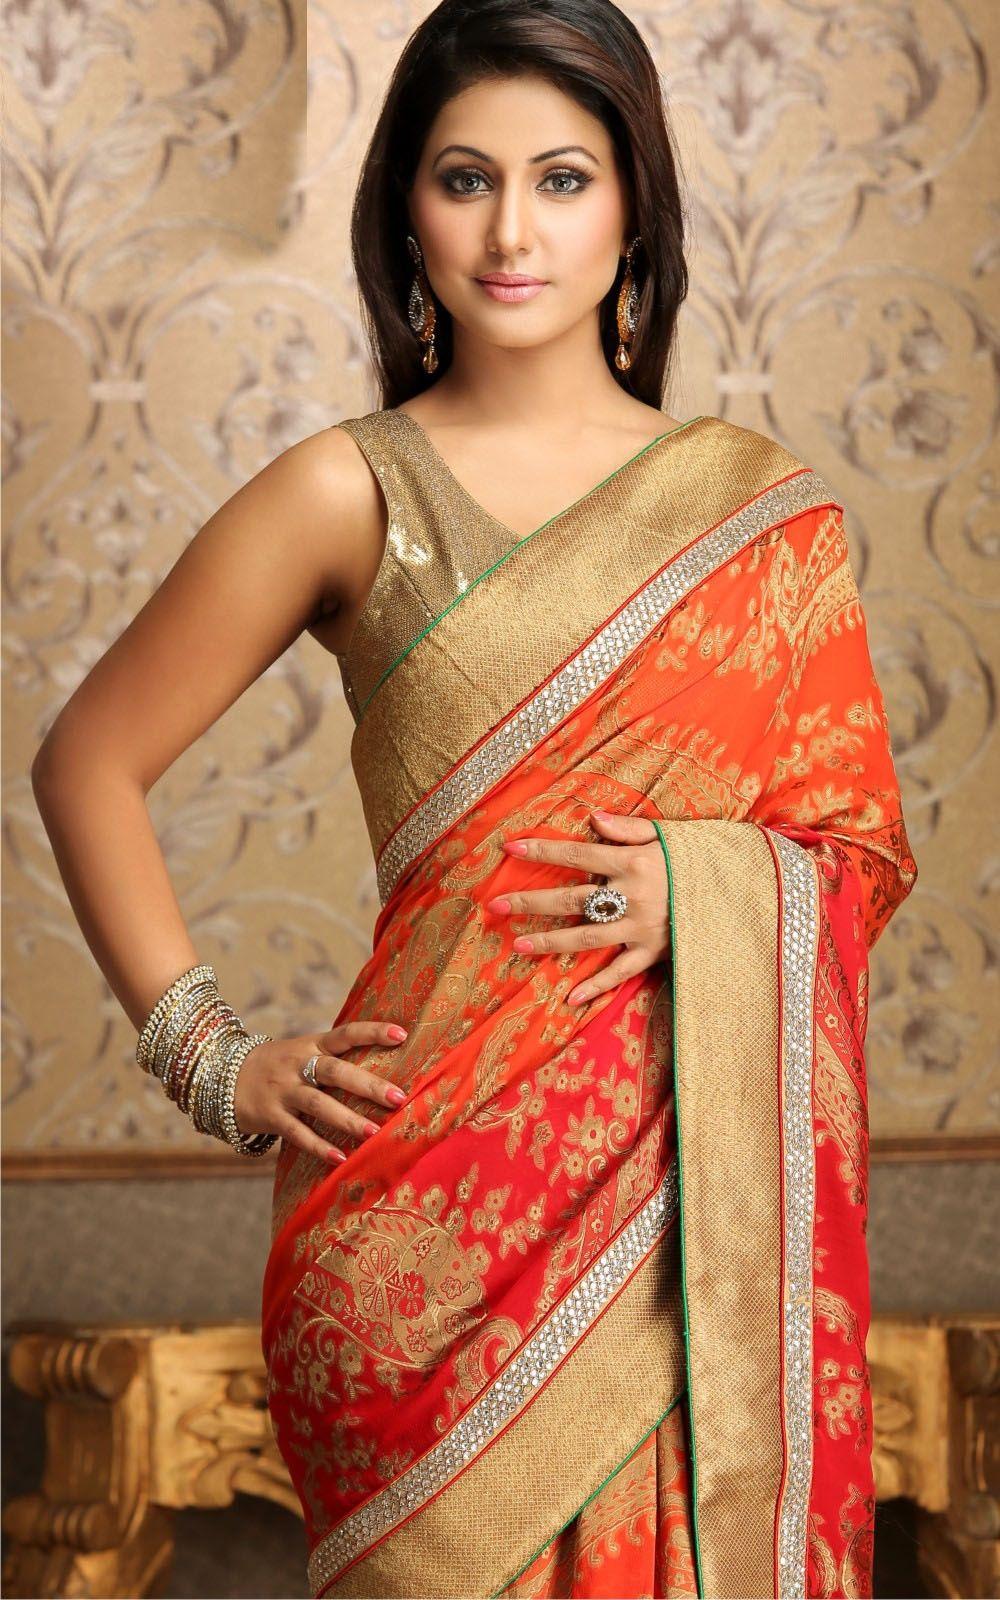 Fashion week Akshara stylish saree collection for woman